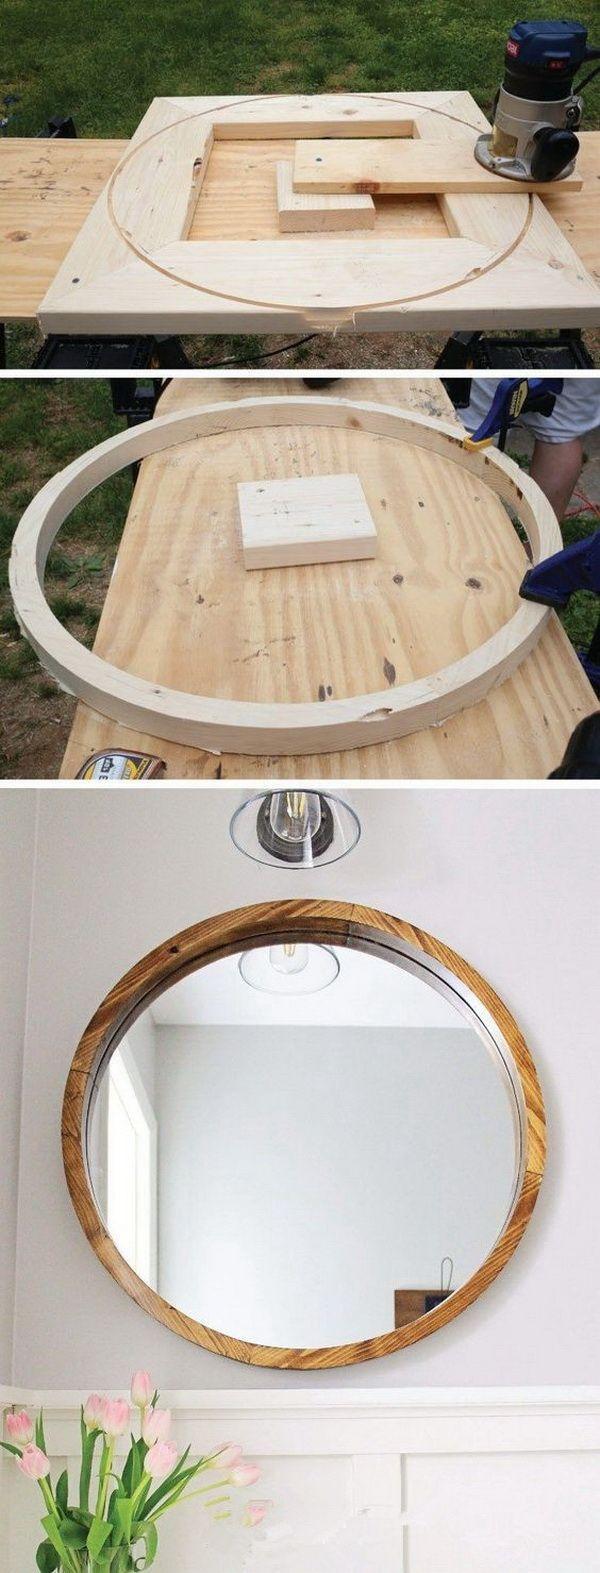 DIY Round Wood Framed Mirror.